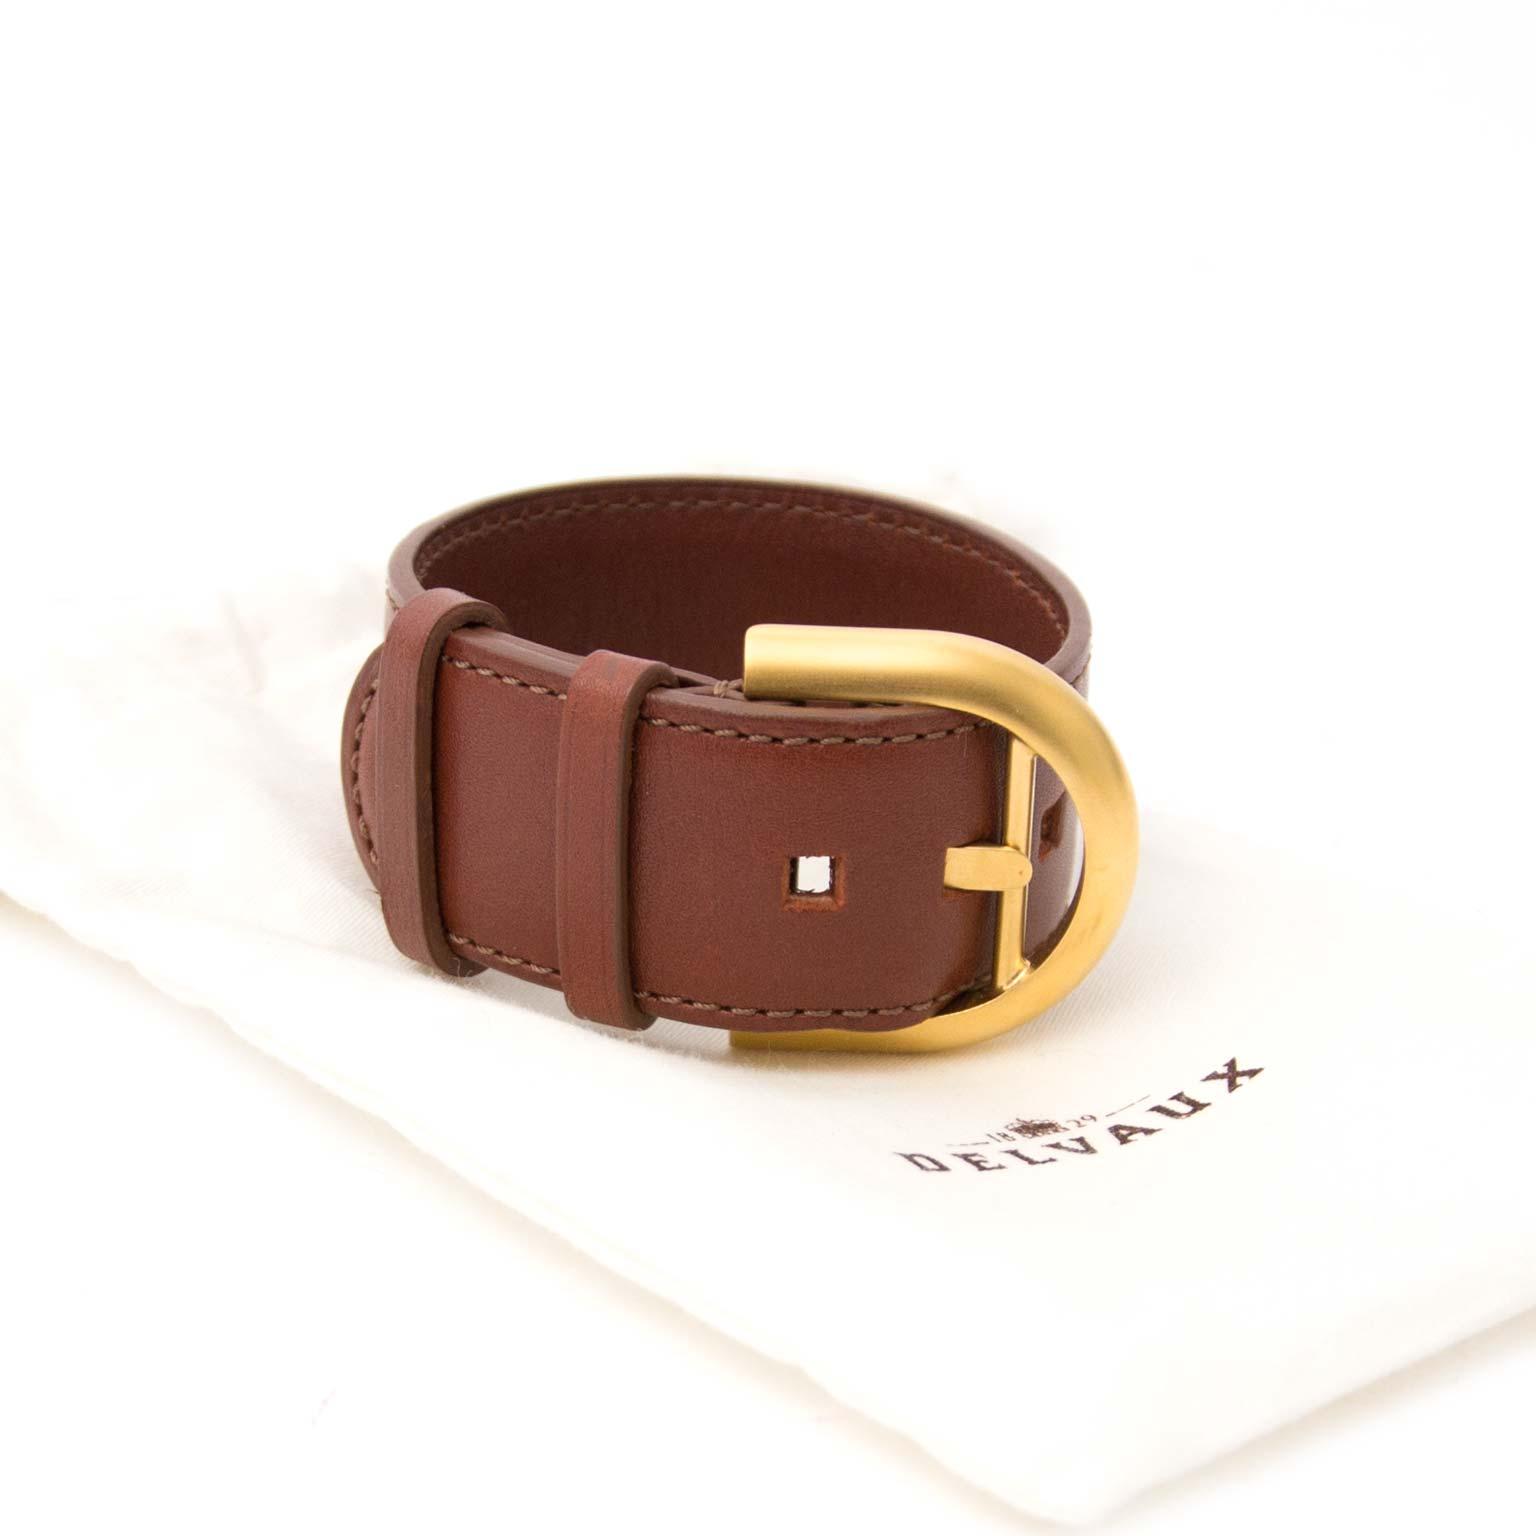 Delvaux Brown and Gold Brillant Bracelet shop safe online at the best price